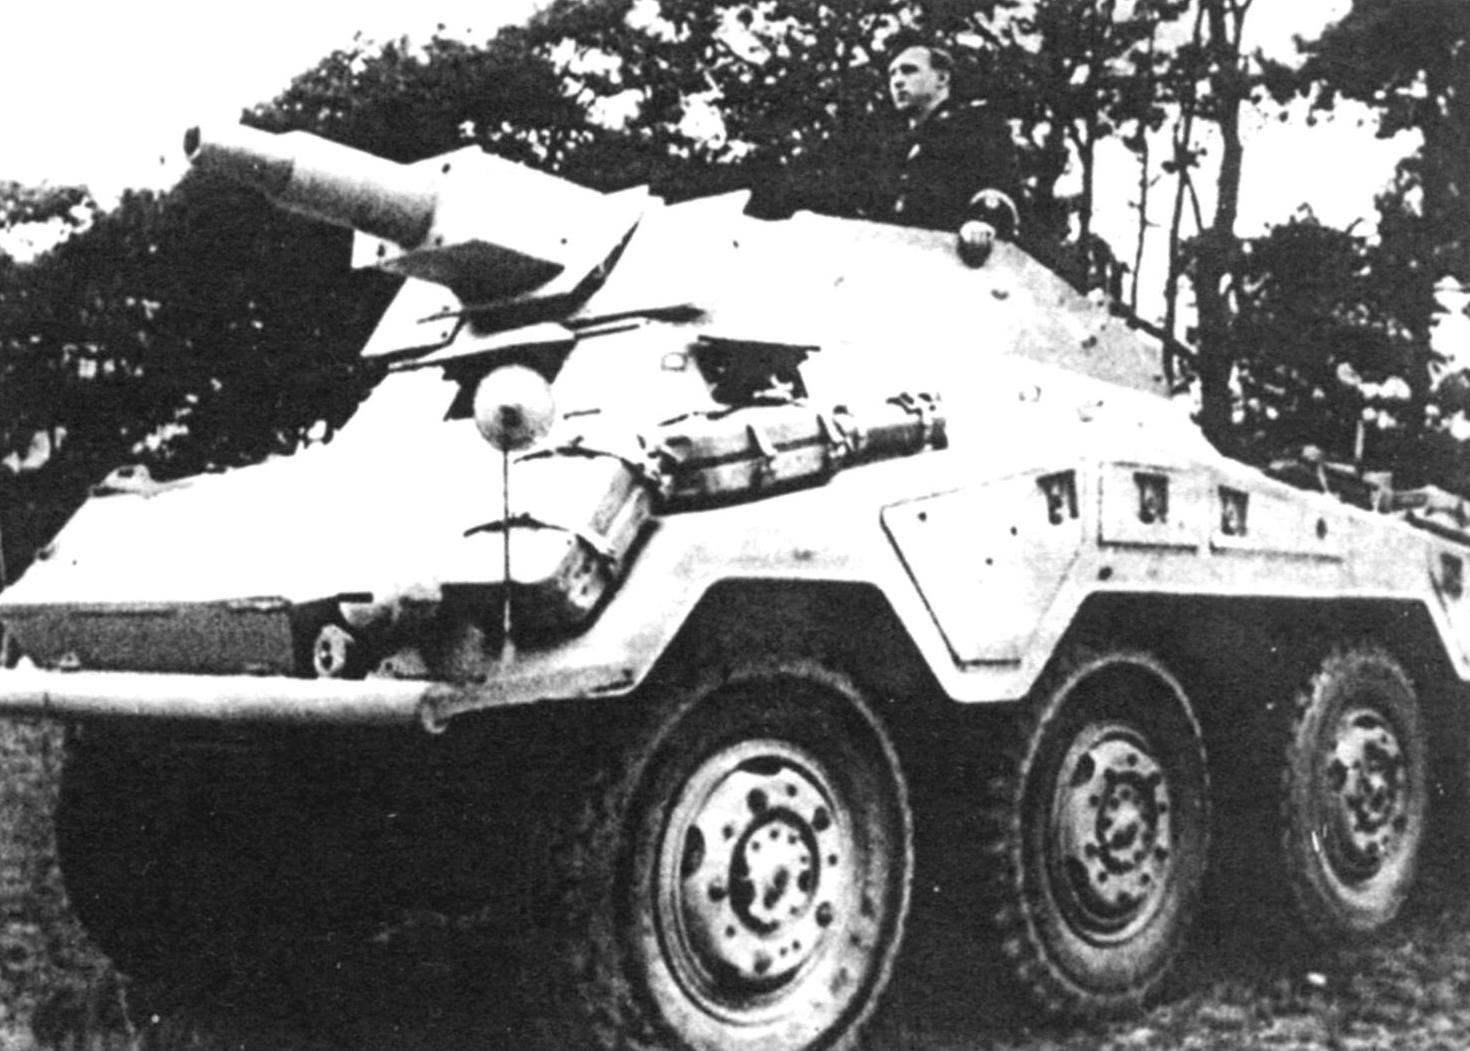 Бронеавтомобиль Sd.Kfz.234/3 с короткоствольной 75-мм пушкой